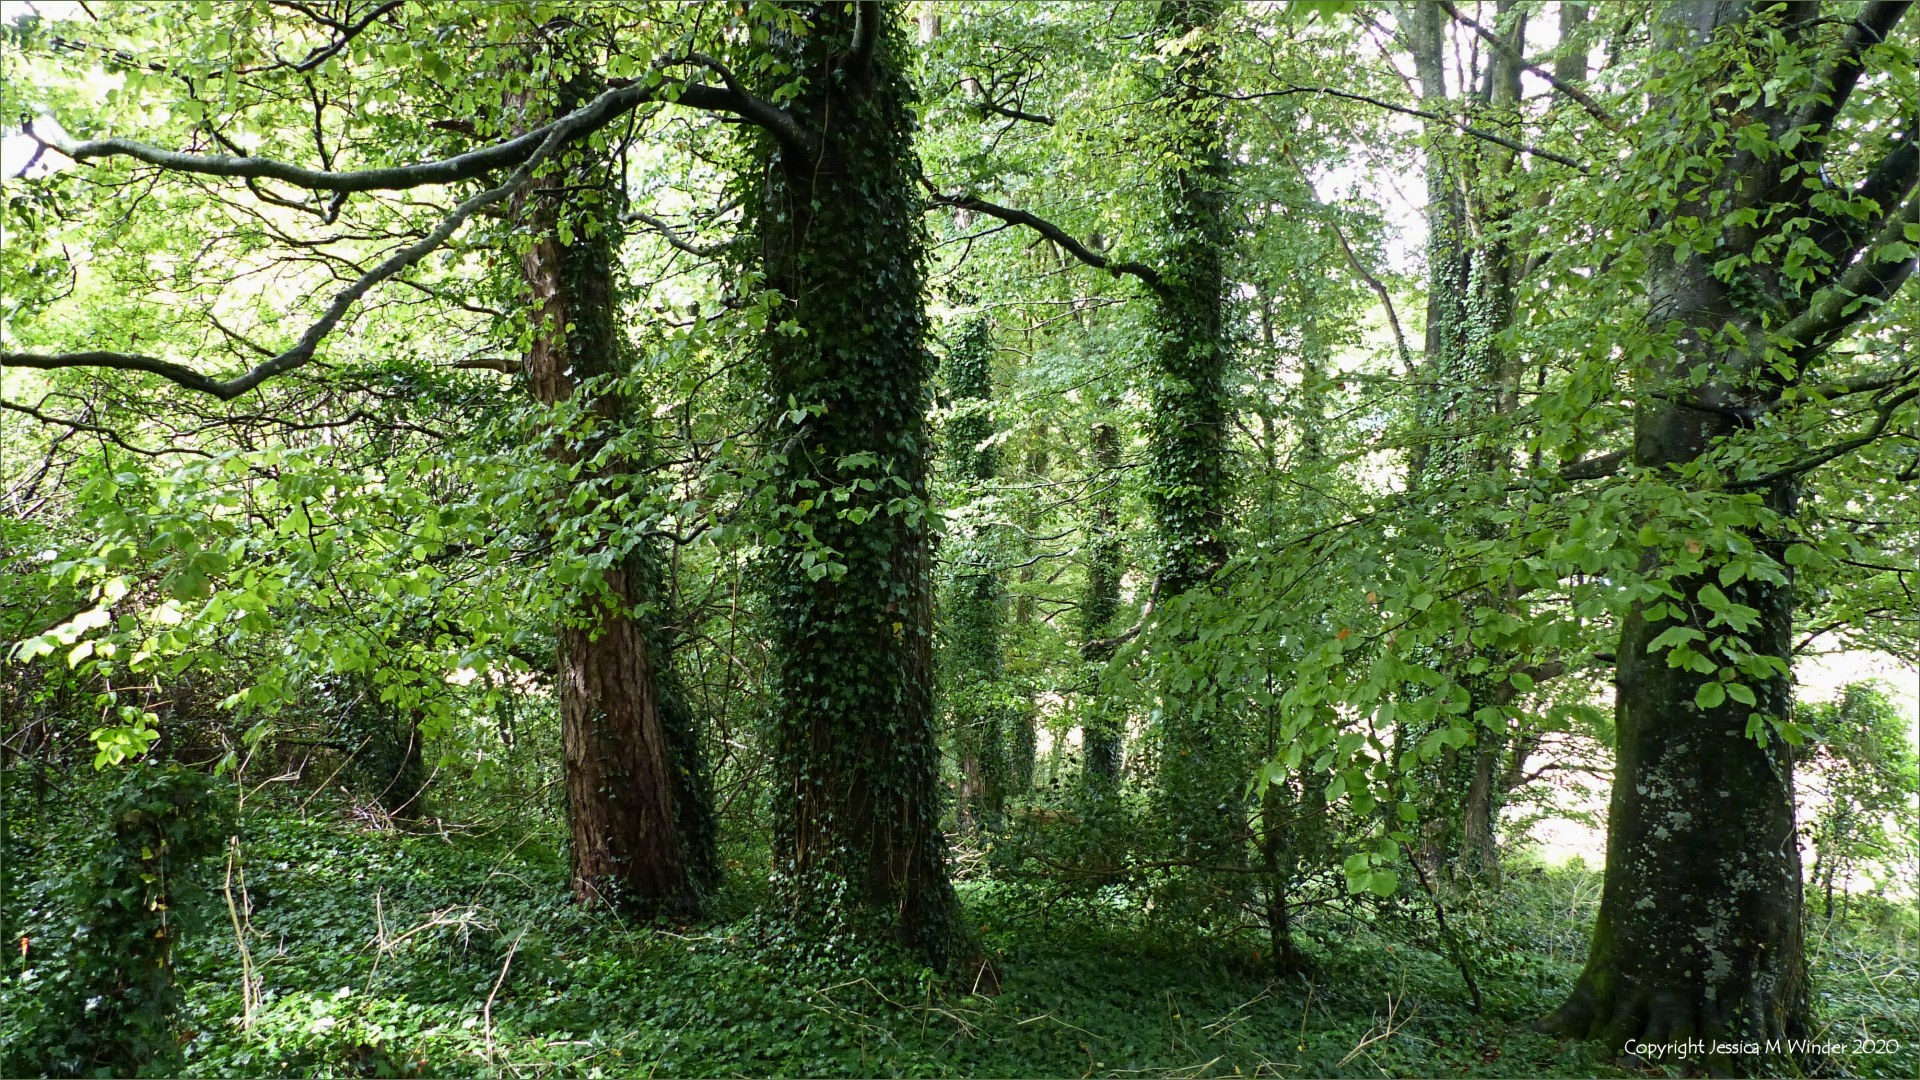 Trees in a narrow woodland belt between fields